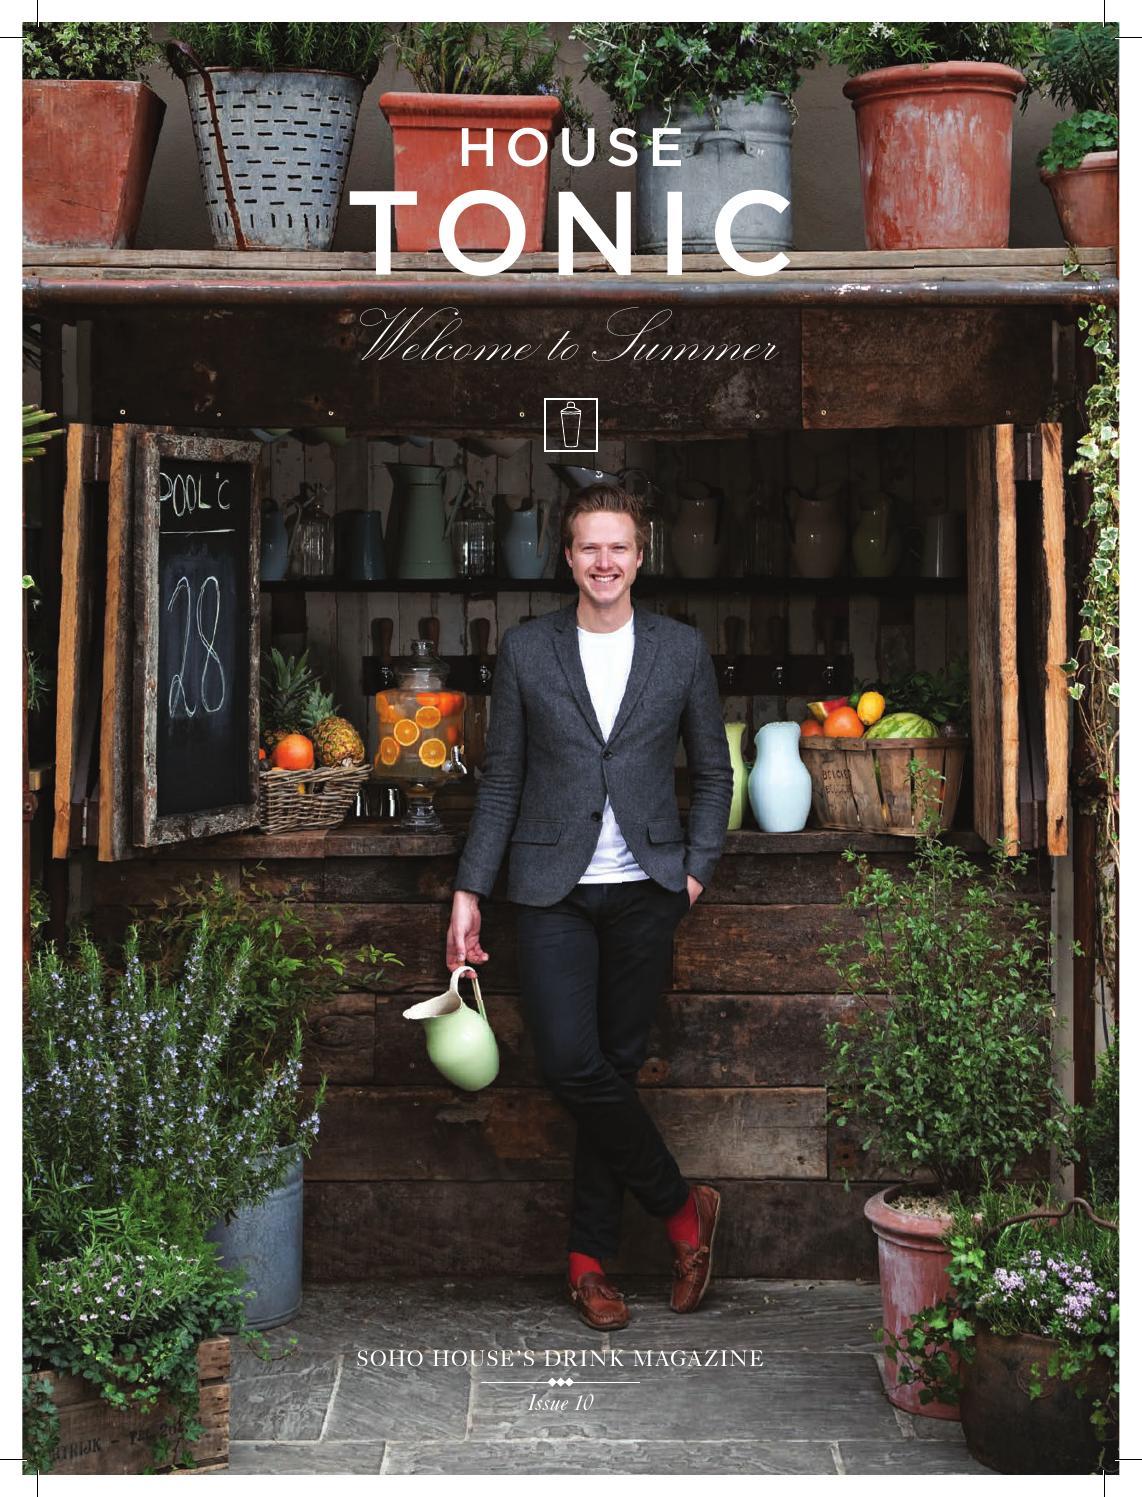 Soho House Shoreditch: House Tonic Issue 10 By Soho House